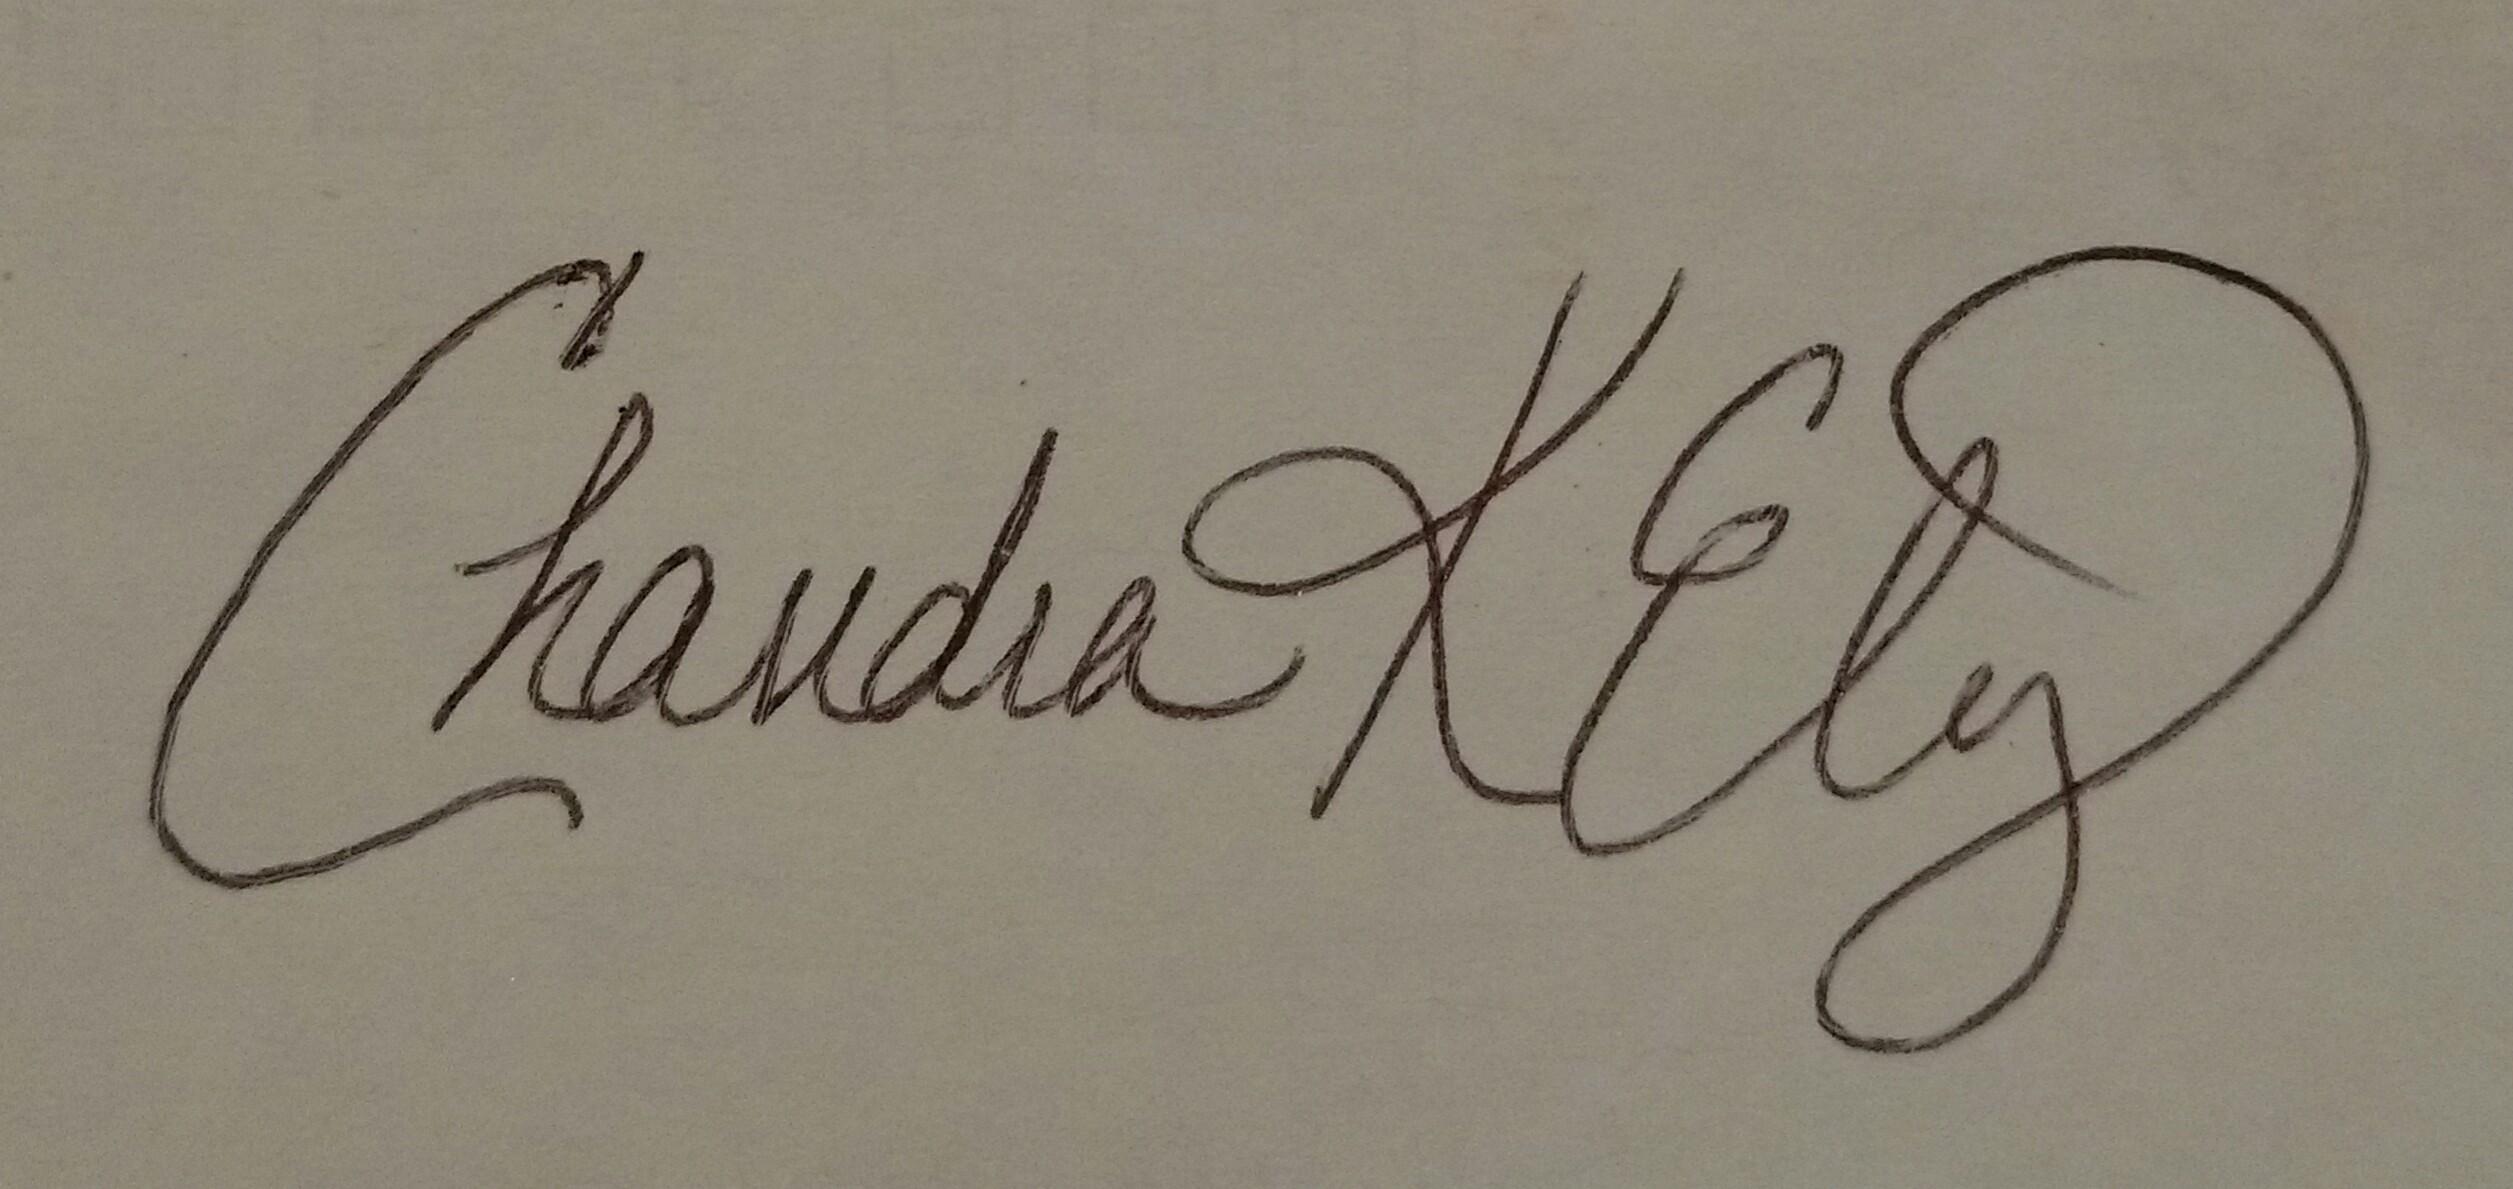 Chandra Ely's Signature